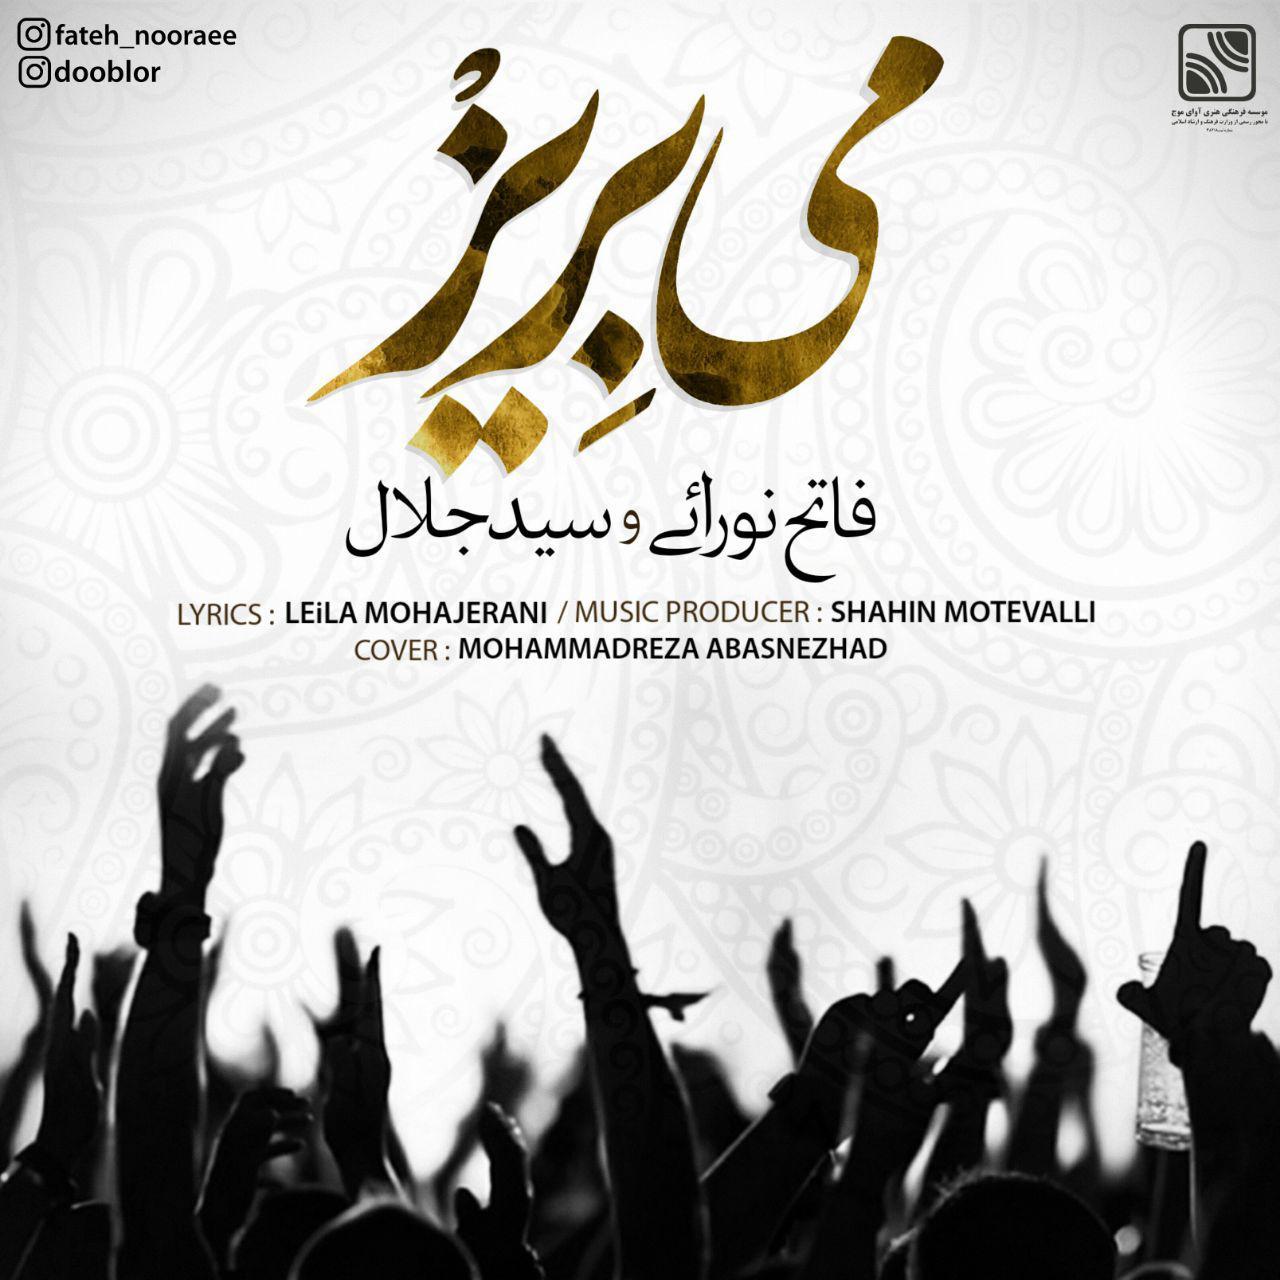 http://www.ganja2music.com/Image/Post/5.2018/Fateh%20Nooraee%20-%20Mey%20Beriz%20(Ft%20Sed%20Jalal).jpg